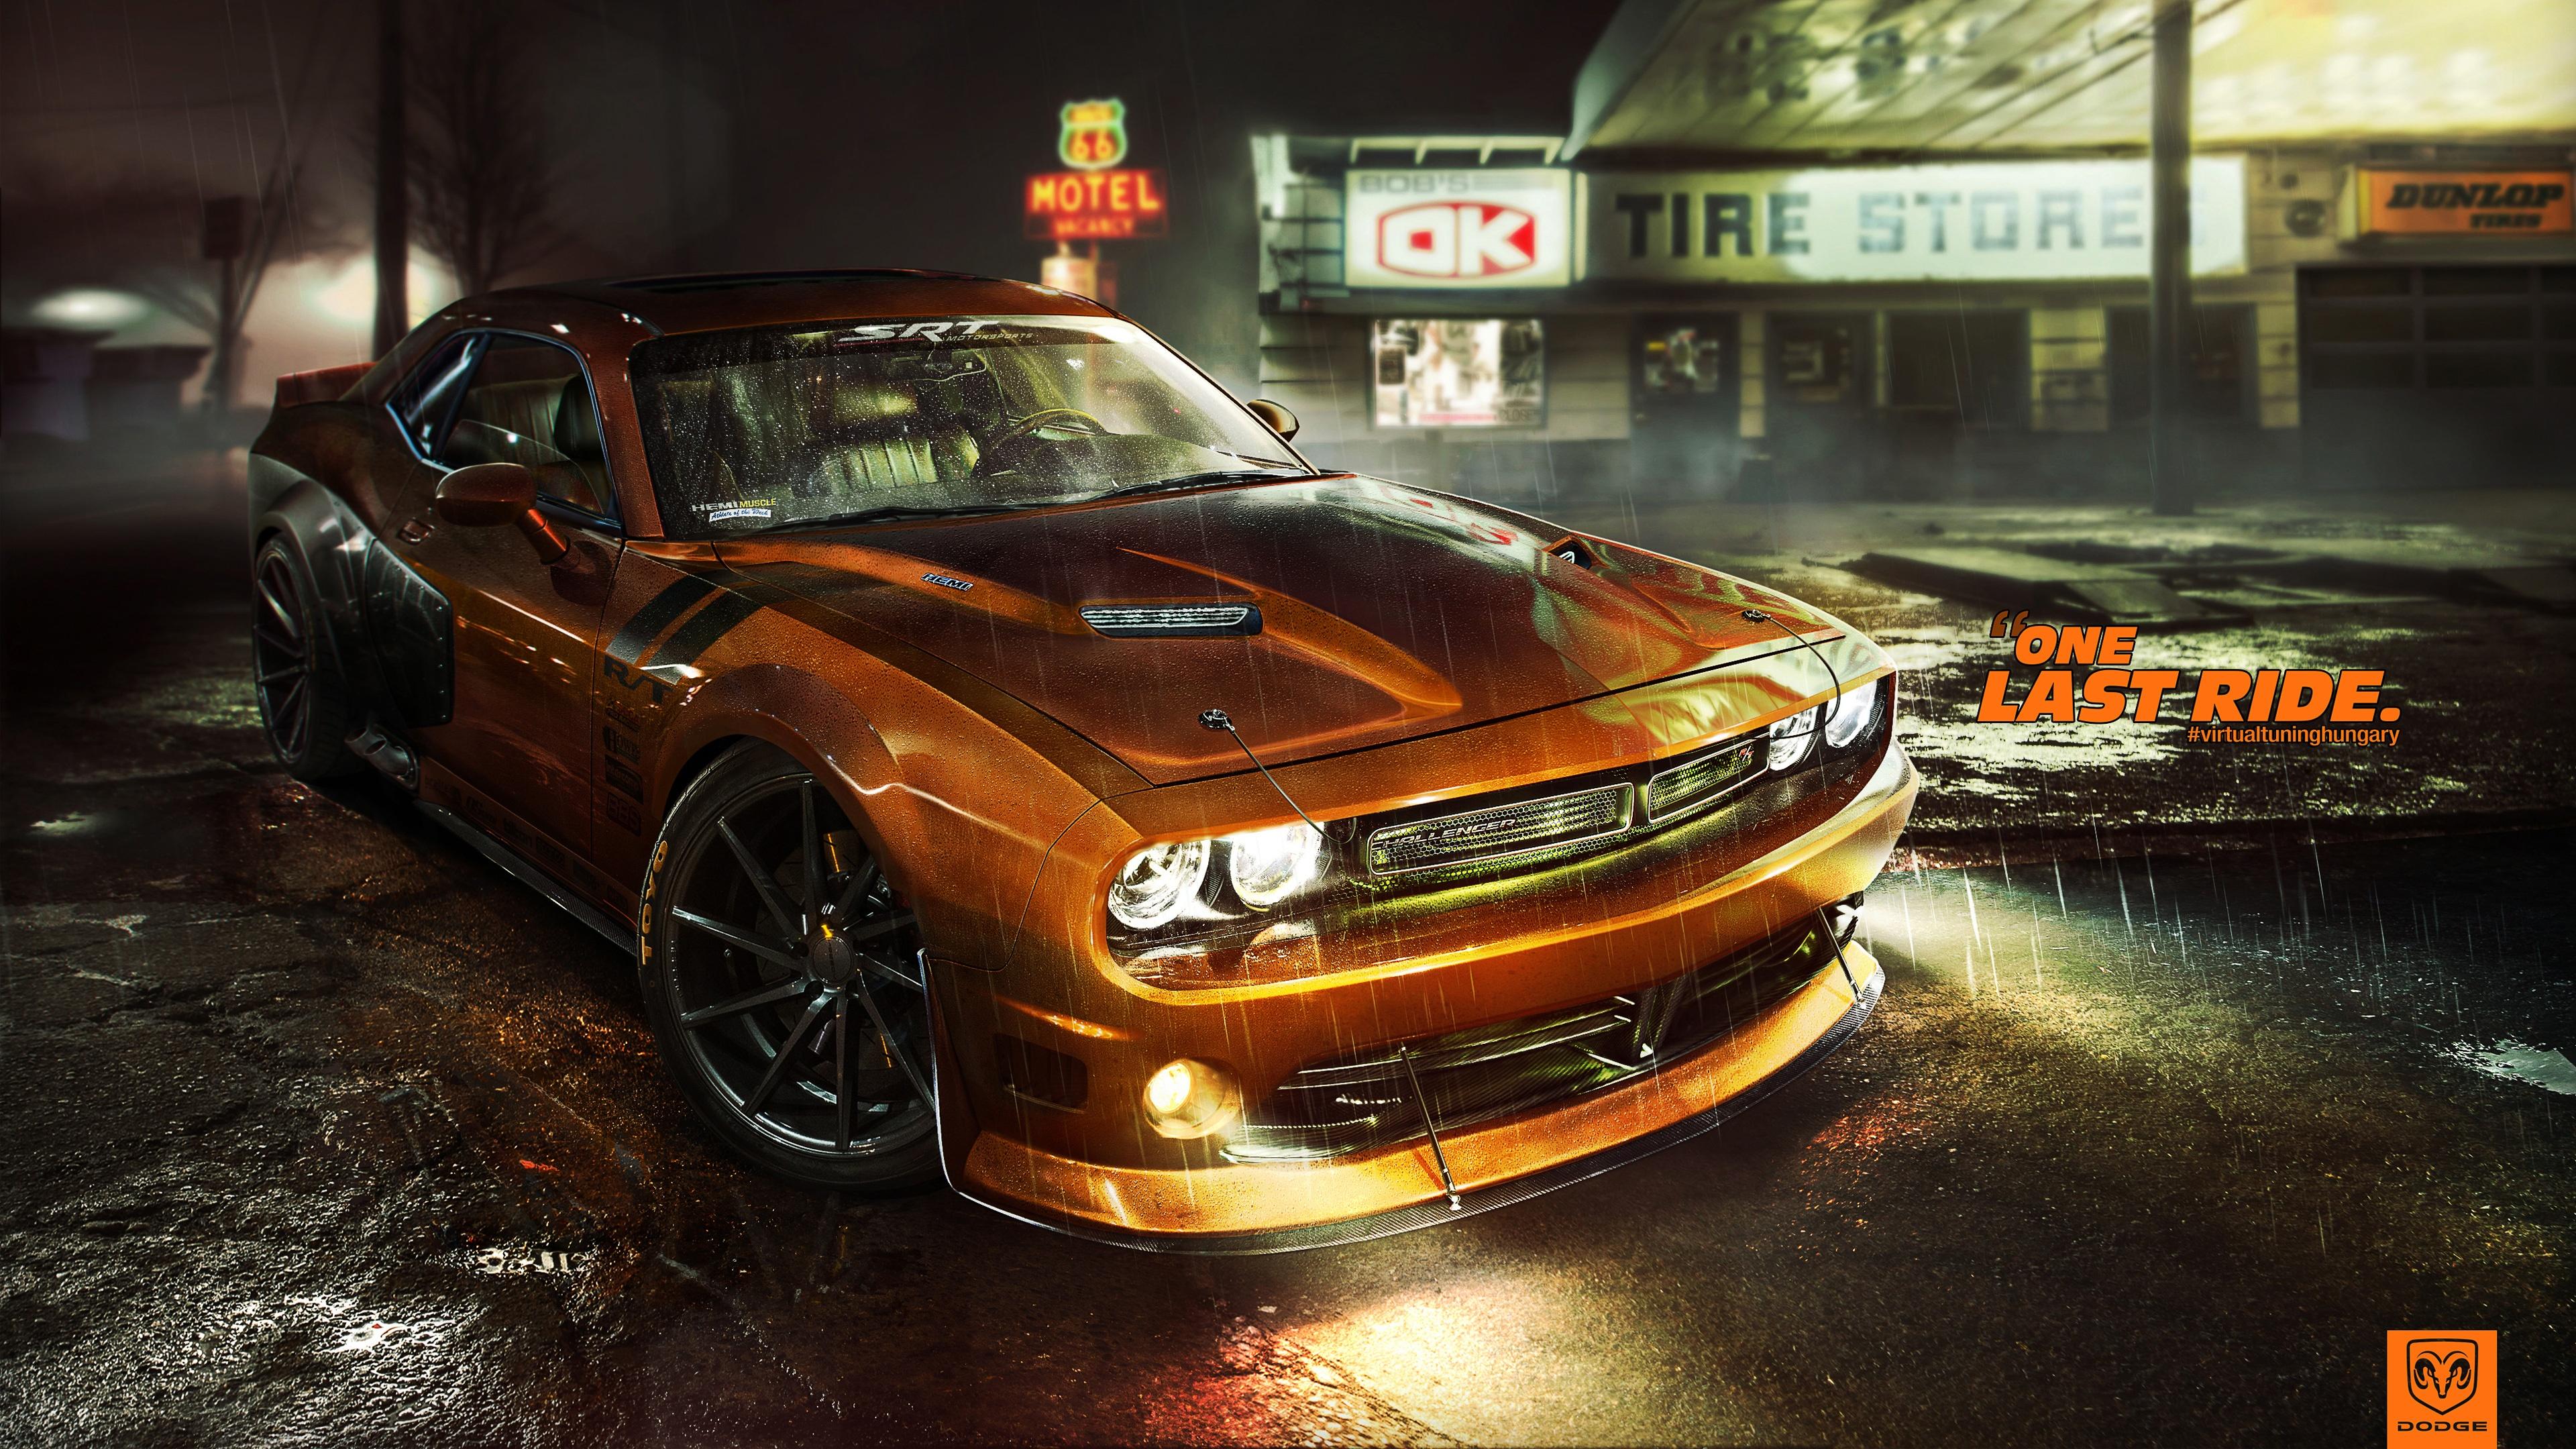 race for wallpaper ultra challenger hd desktop rt dodge wide wallpapers